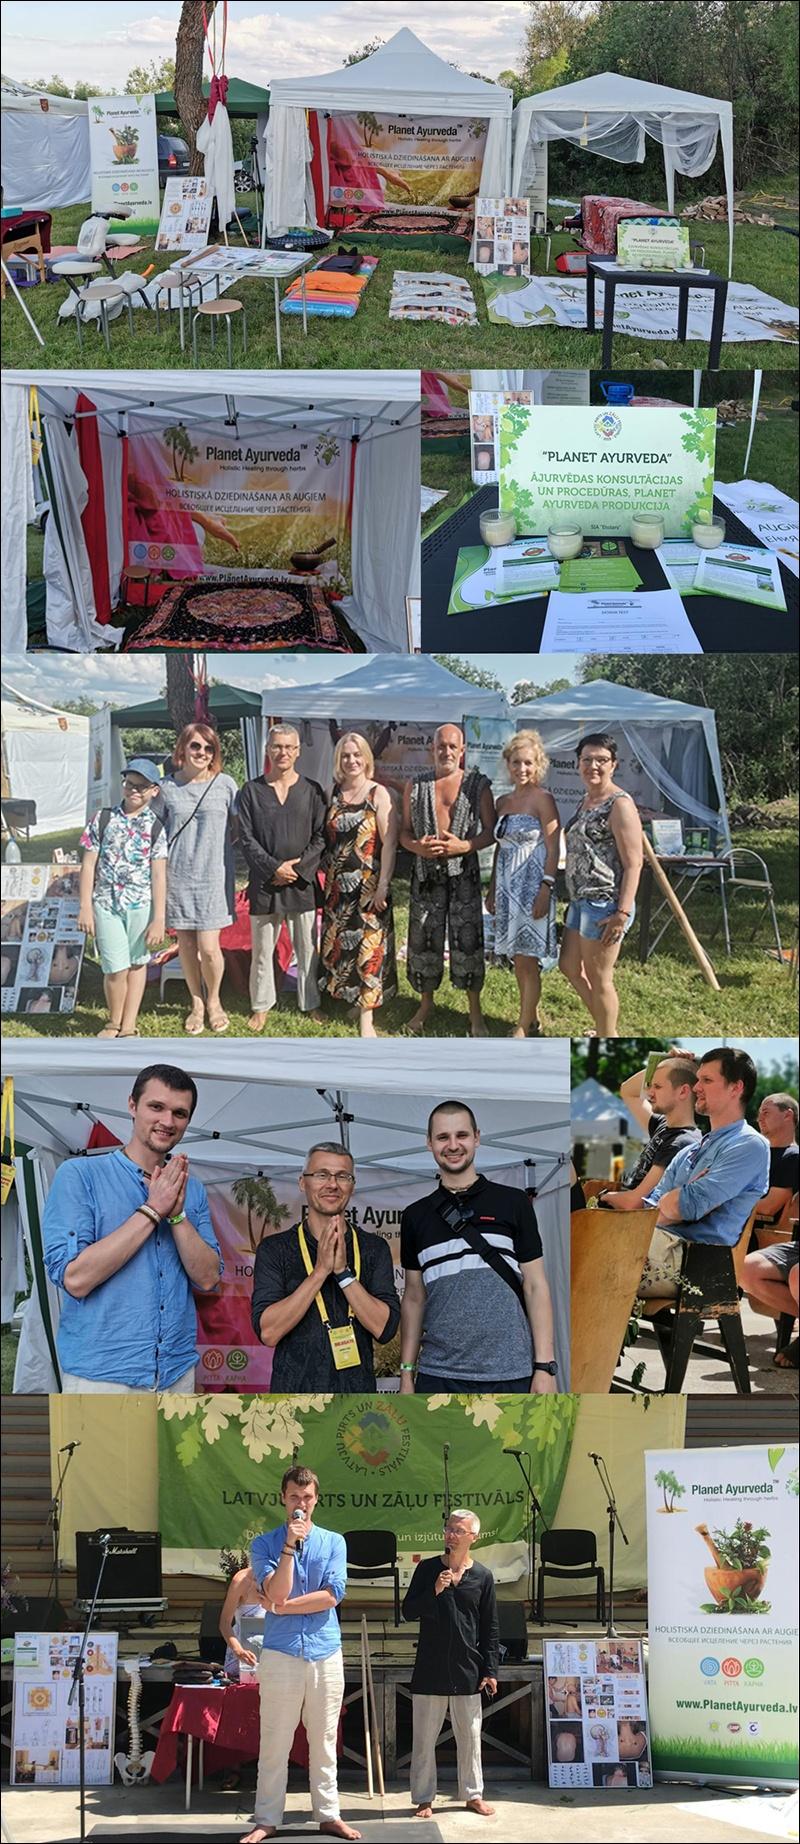 latvian sauna and medicine festival, ayurveda in lavia